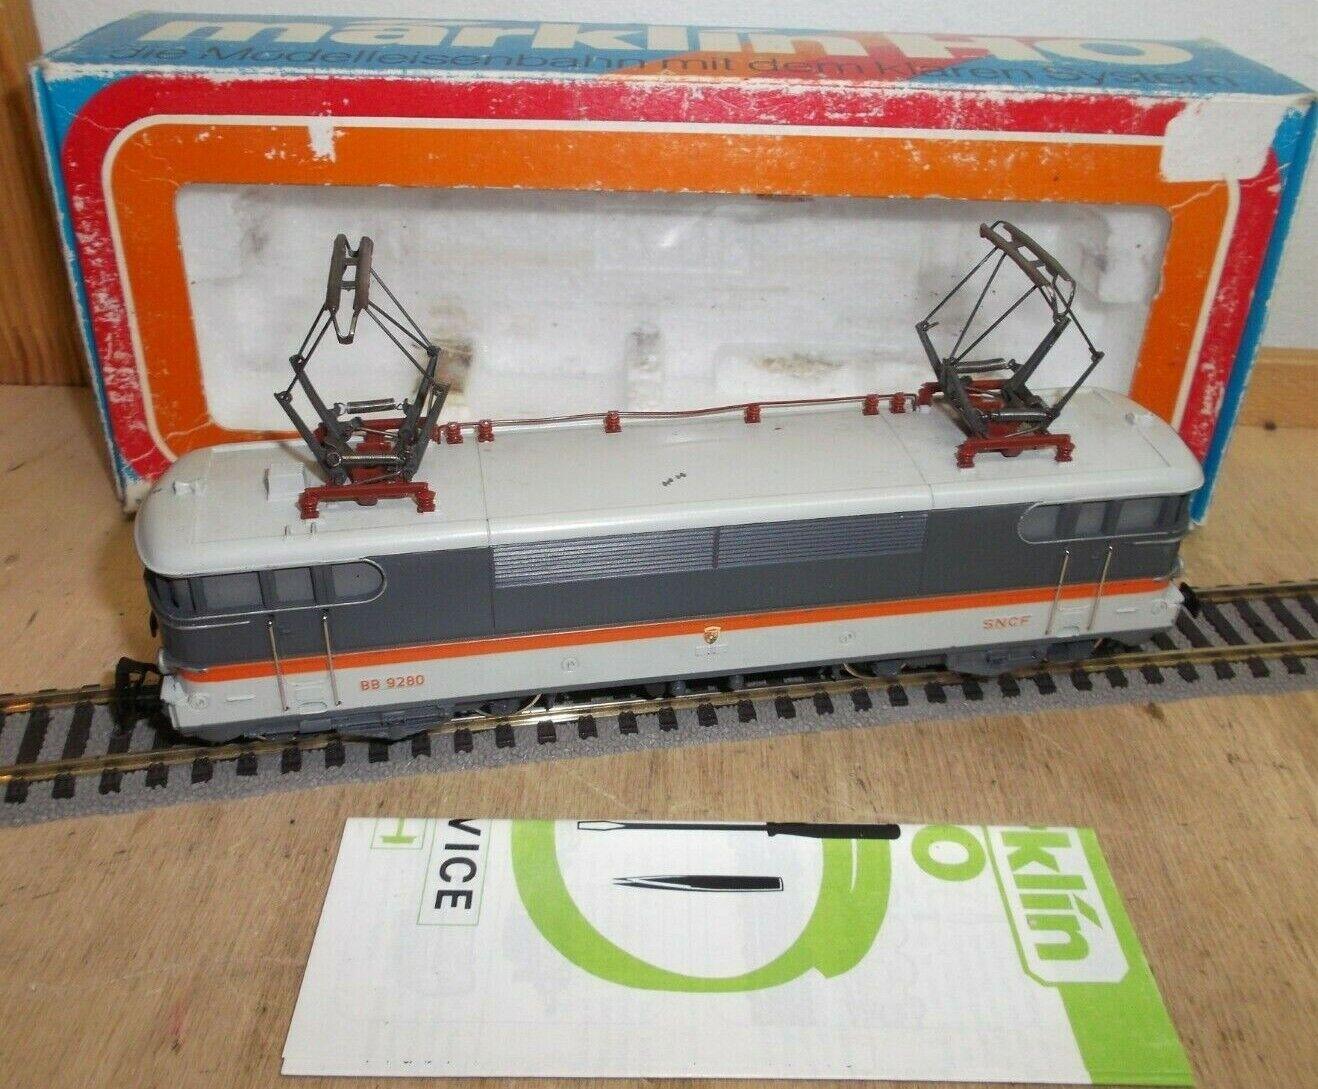 Digital Märklin H0 3165 Electric Locomotive Br Bb 9280   Corail   SNCF Metal